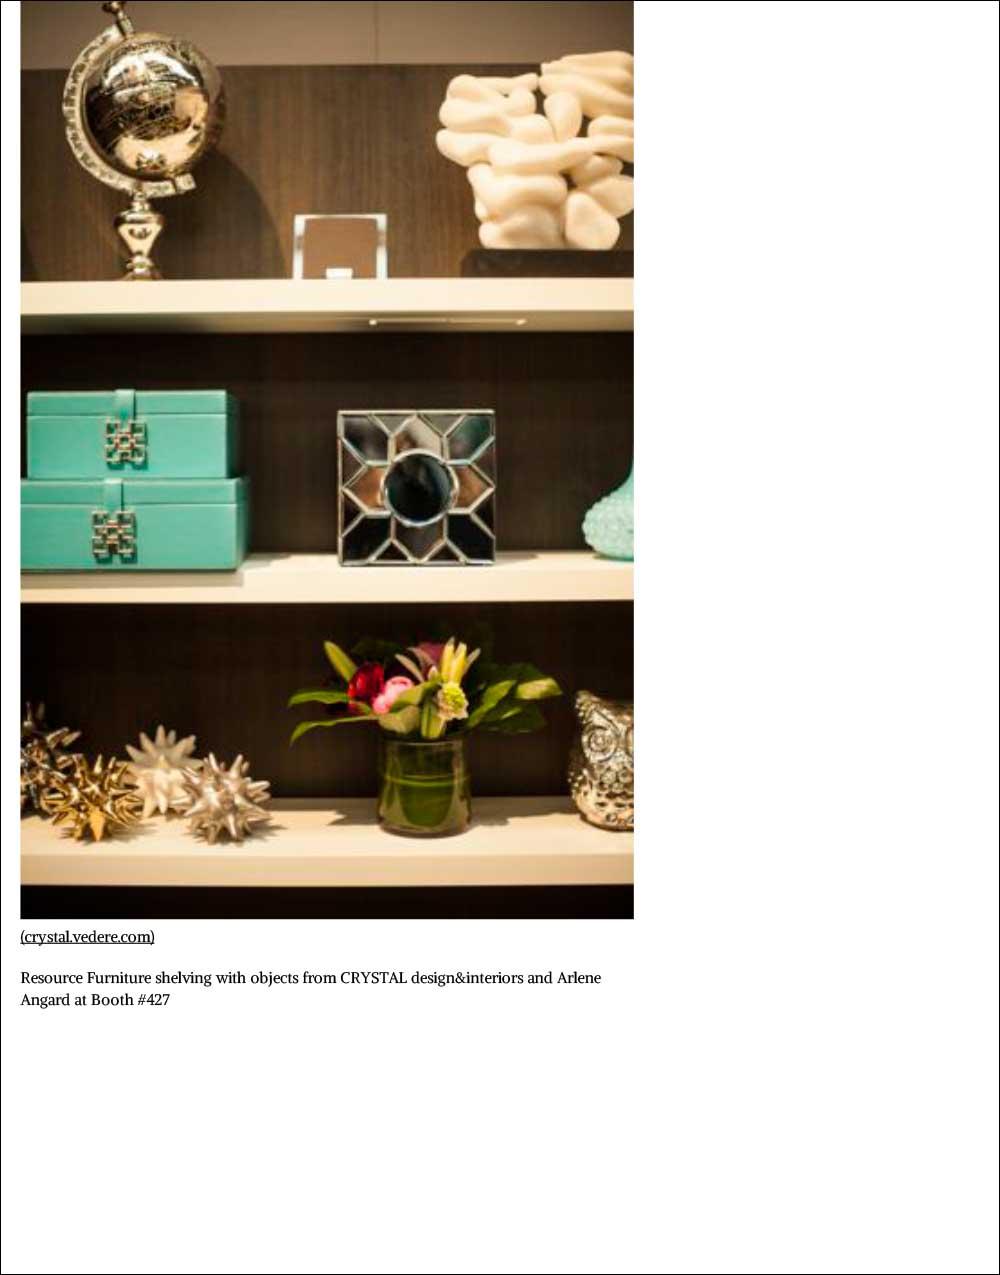 Architectural Digest Home Design Show Recap - Vedere Blog